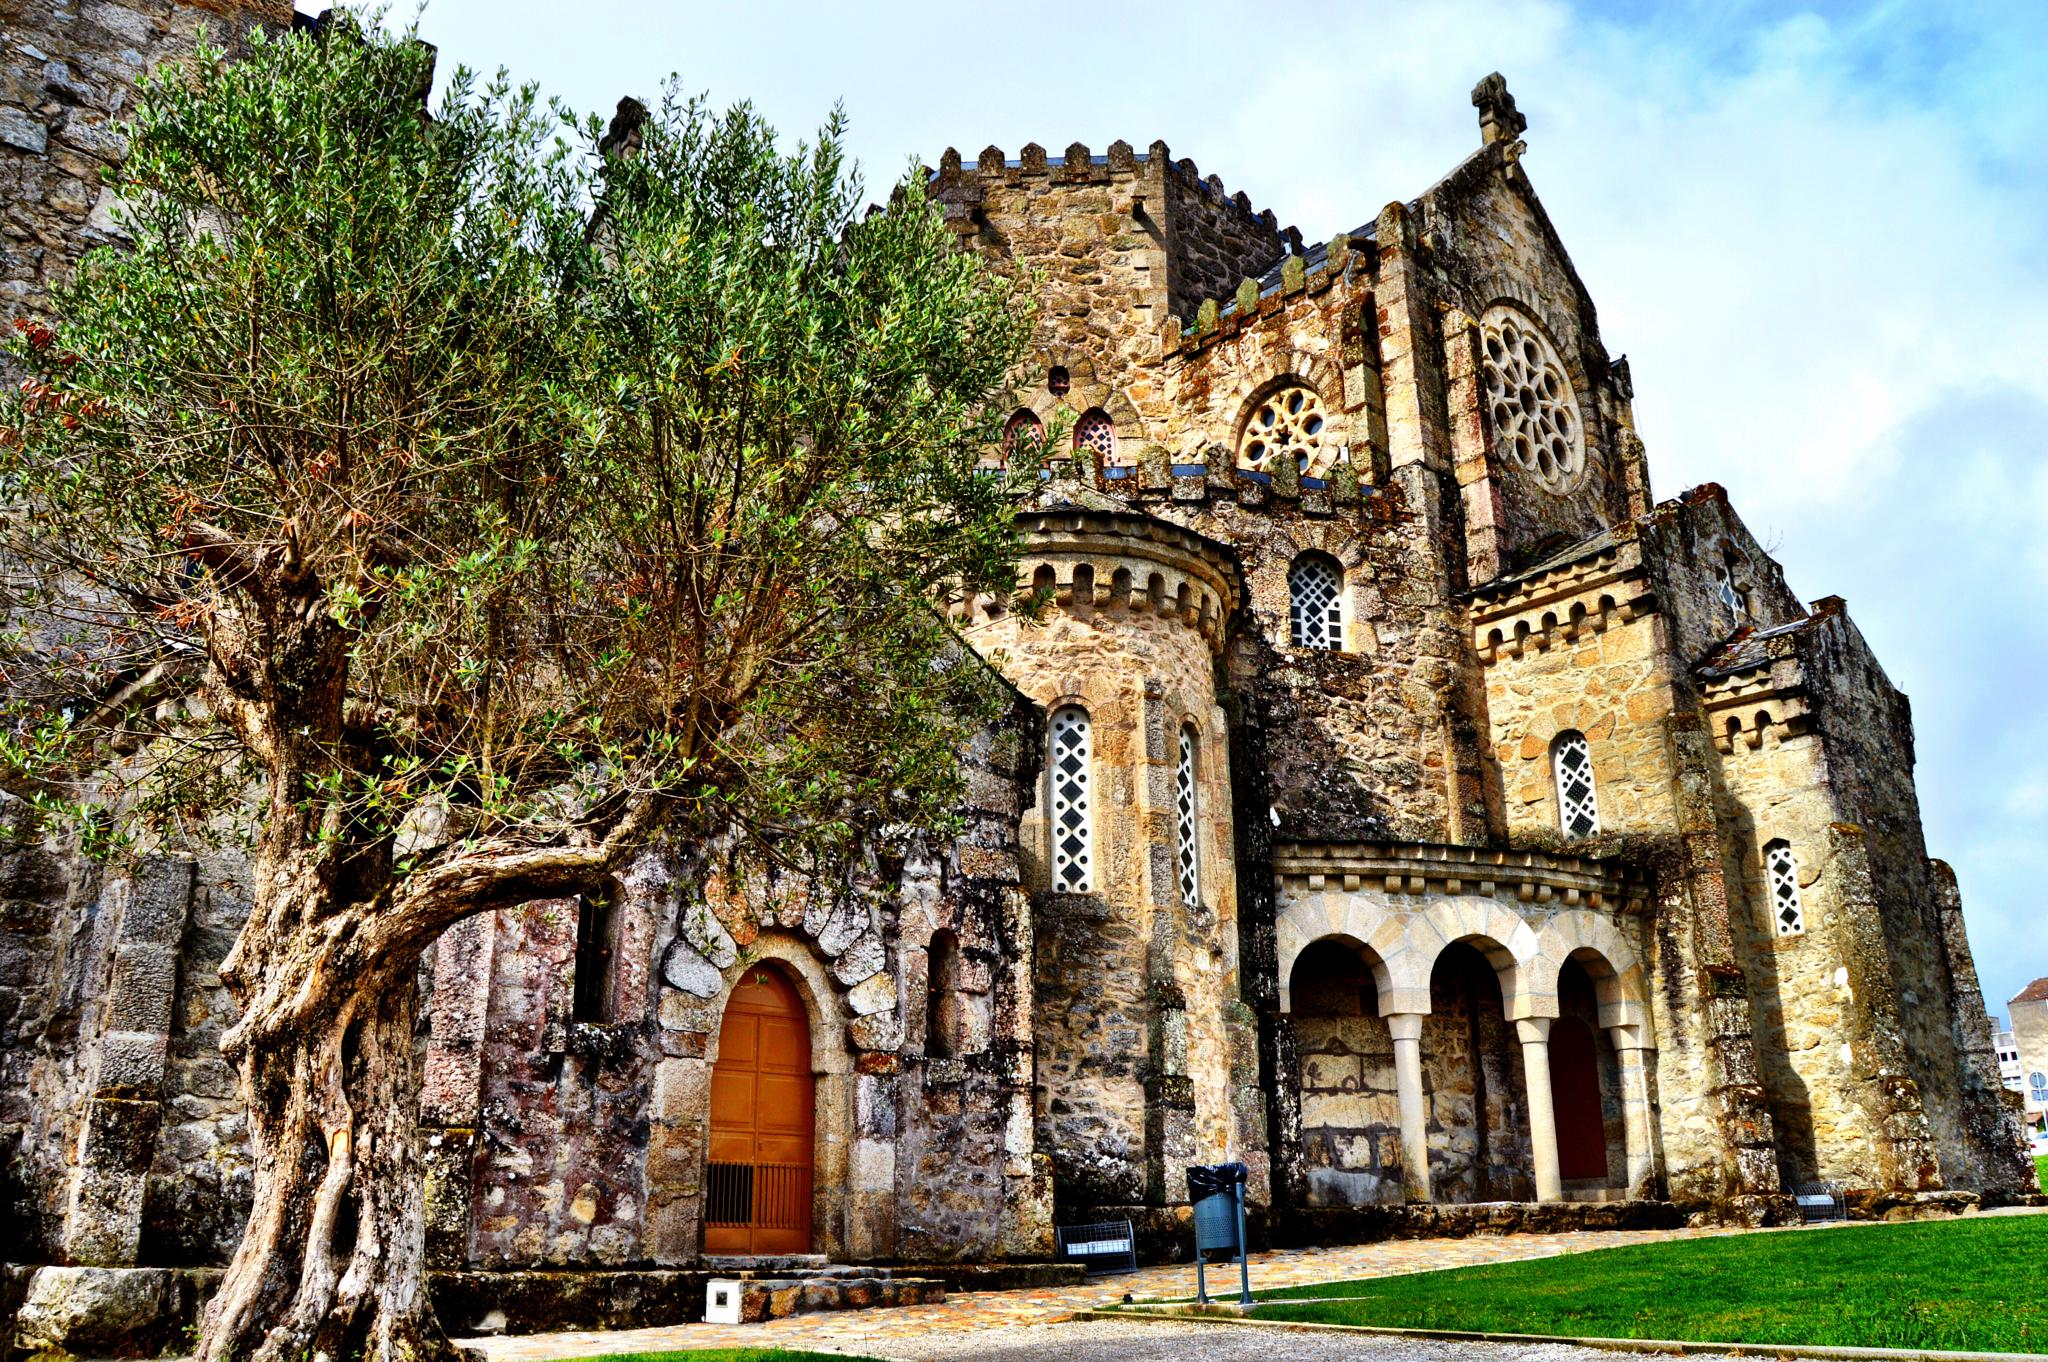 Iglesia de la Vera Cruz (O Carballiño - Spain) by Angel Alicarte Lopez